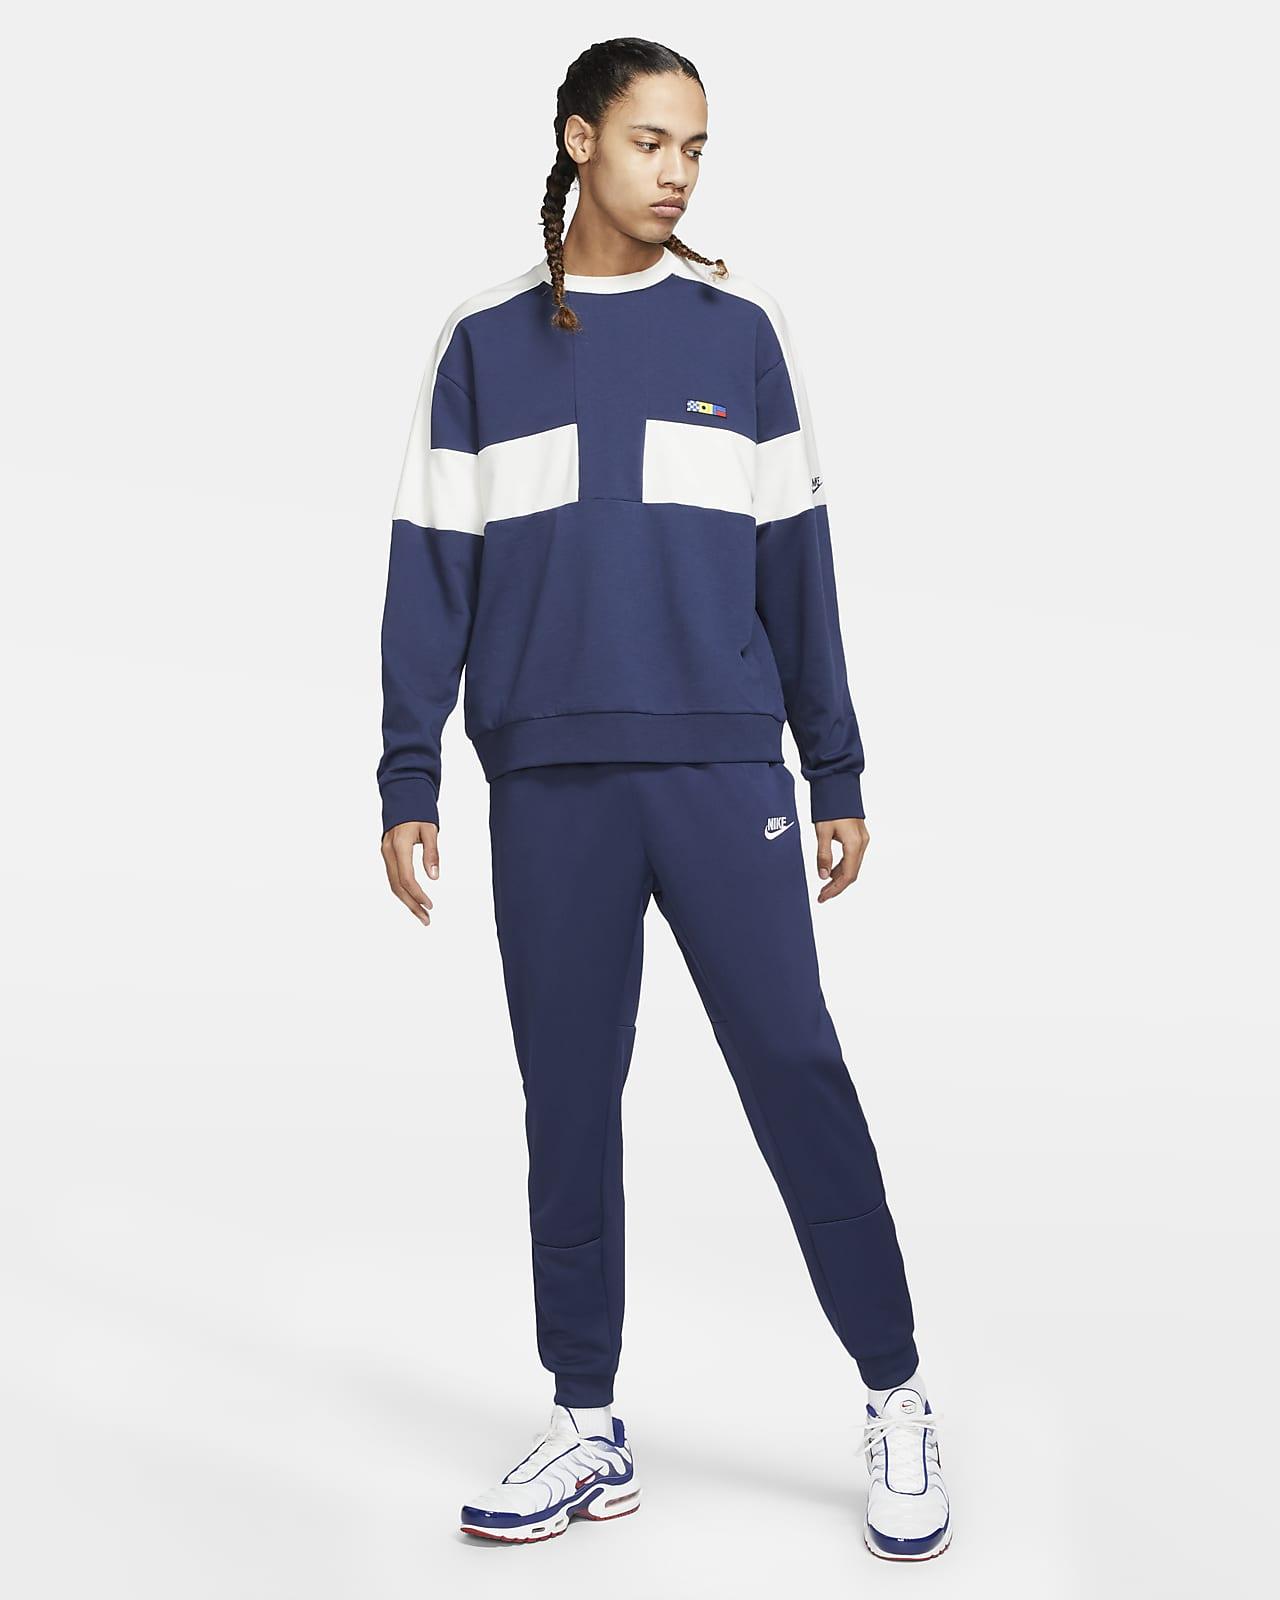 Predownload: Nike Sportswear Reissue Men S French Terry Crew Nike Lu [ 1600 x 1280 Pixel ]